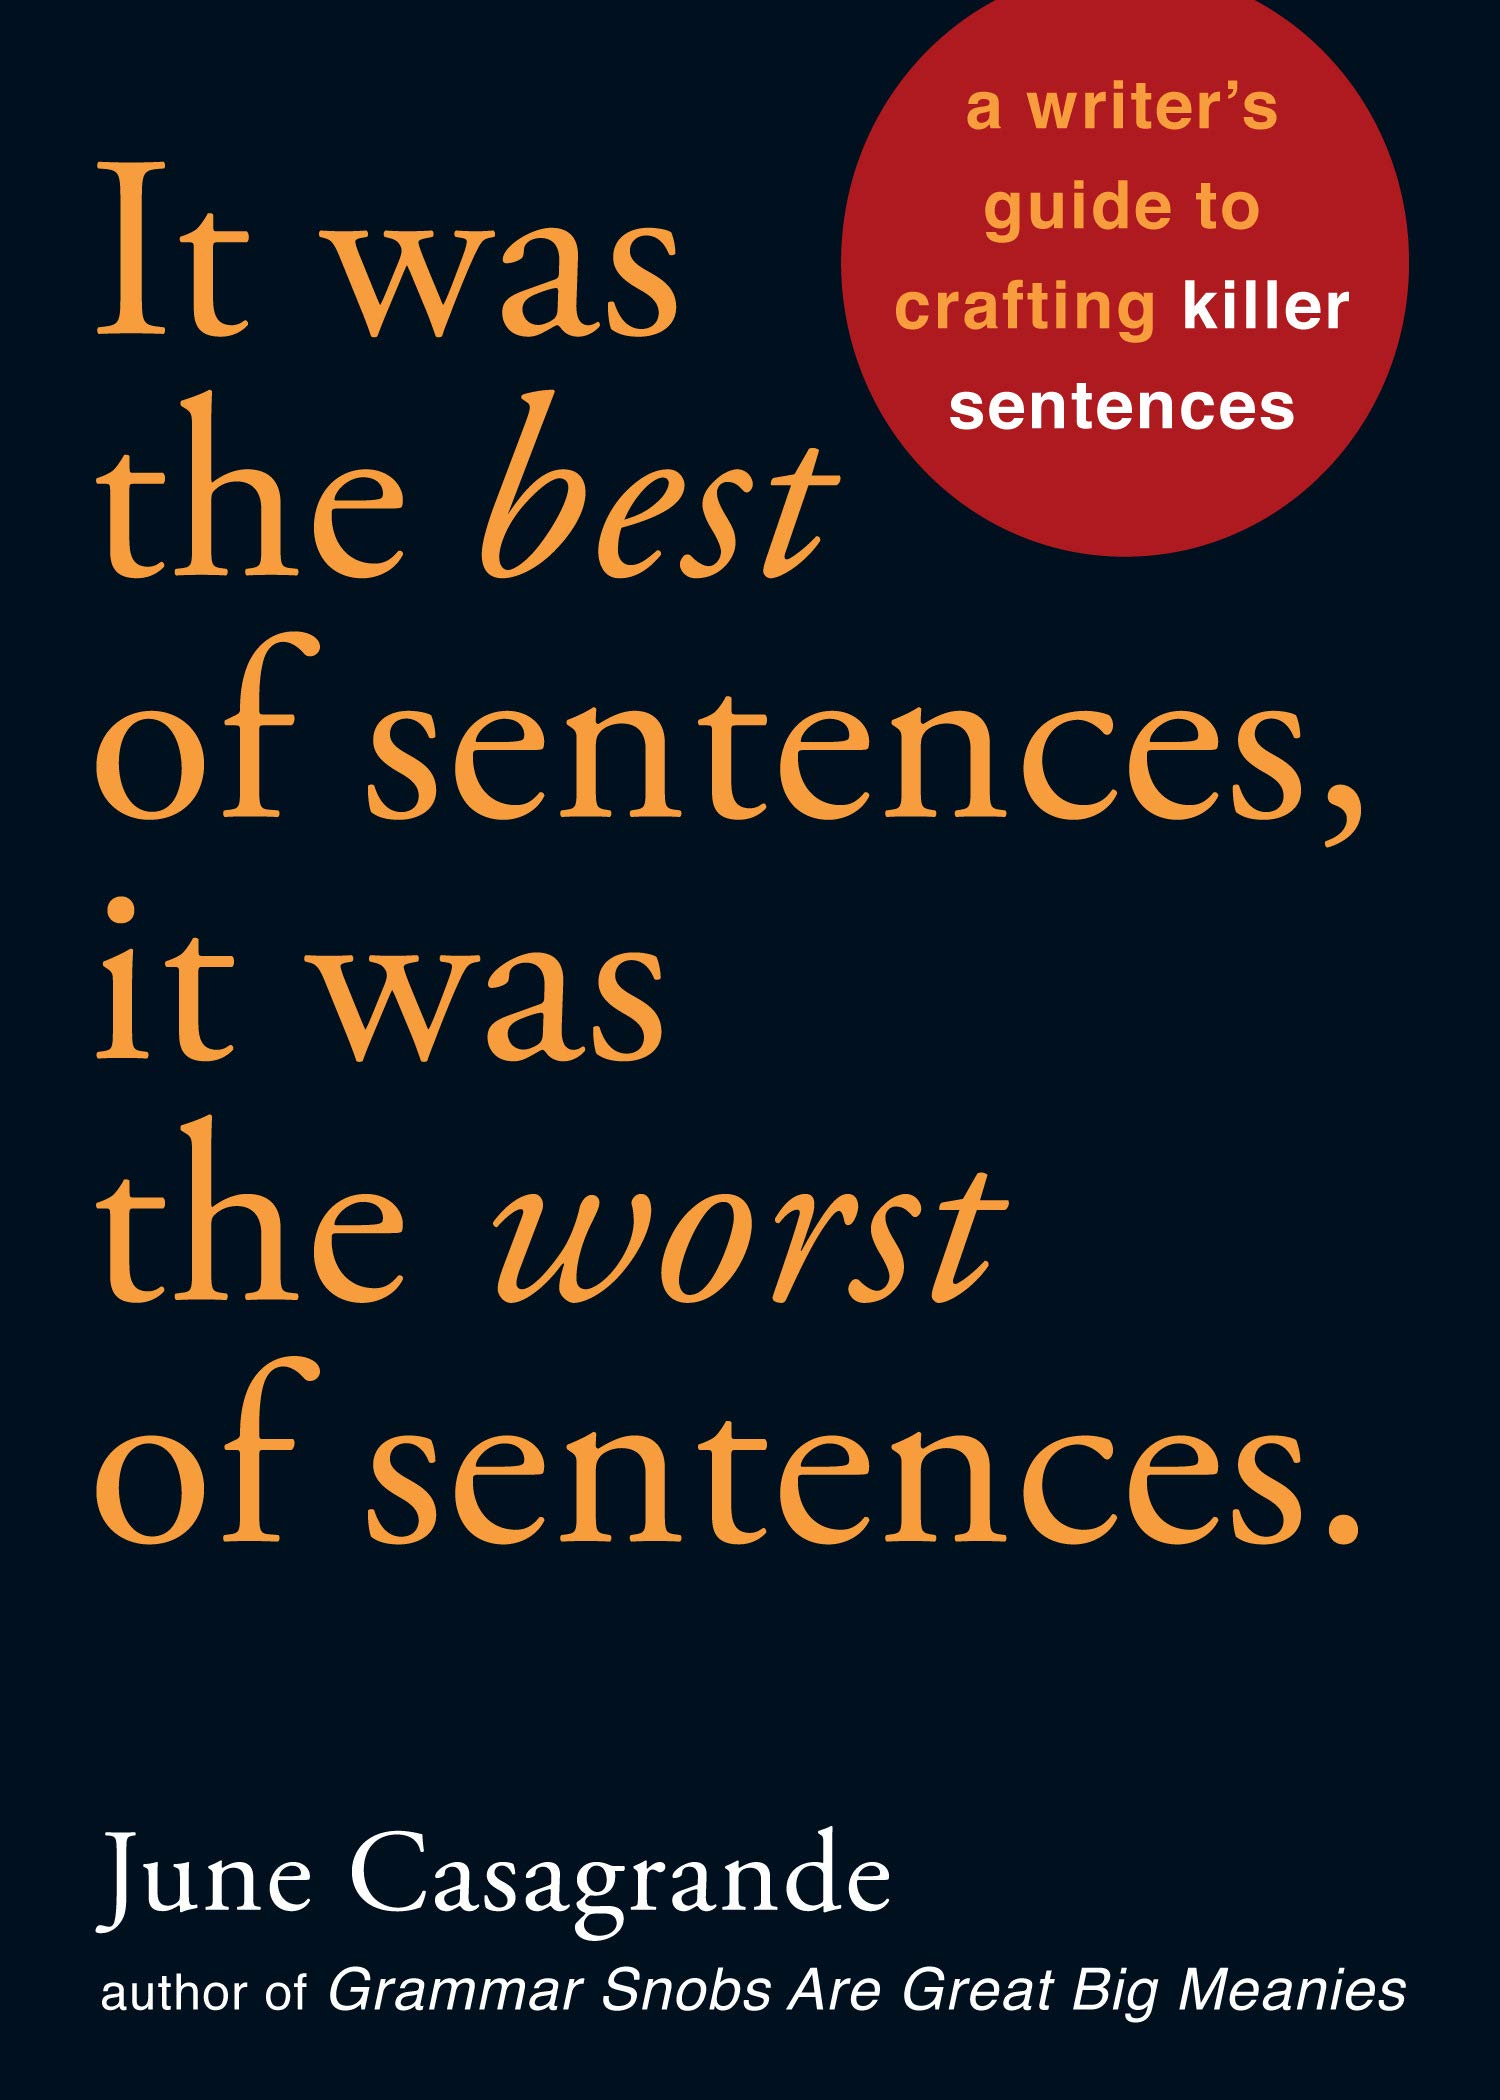 Was Best Sentences Worst Crafting